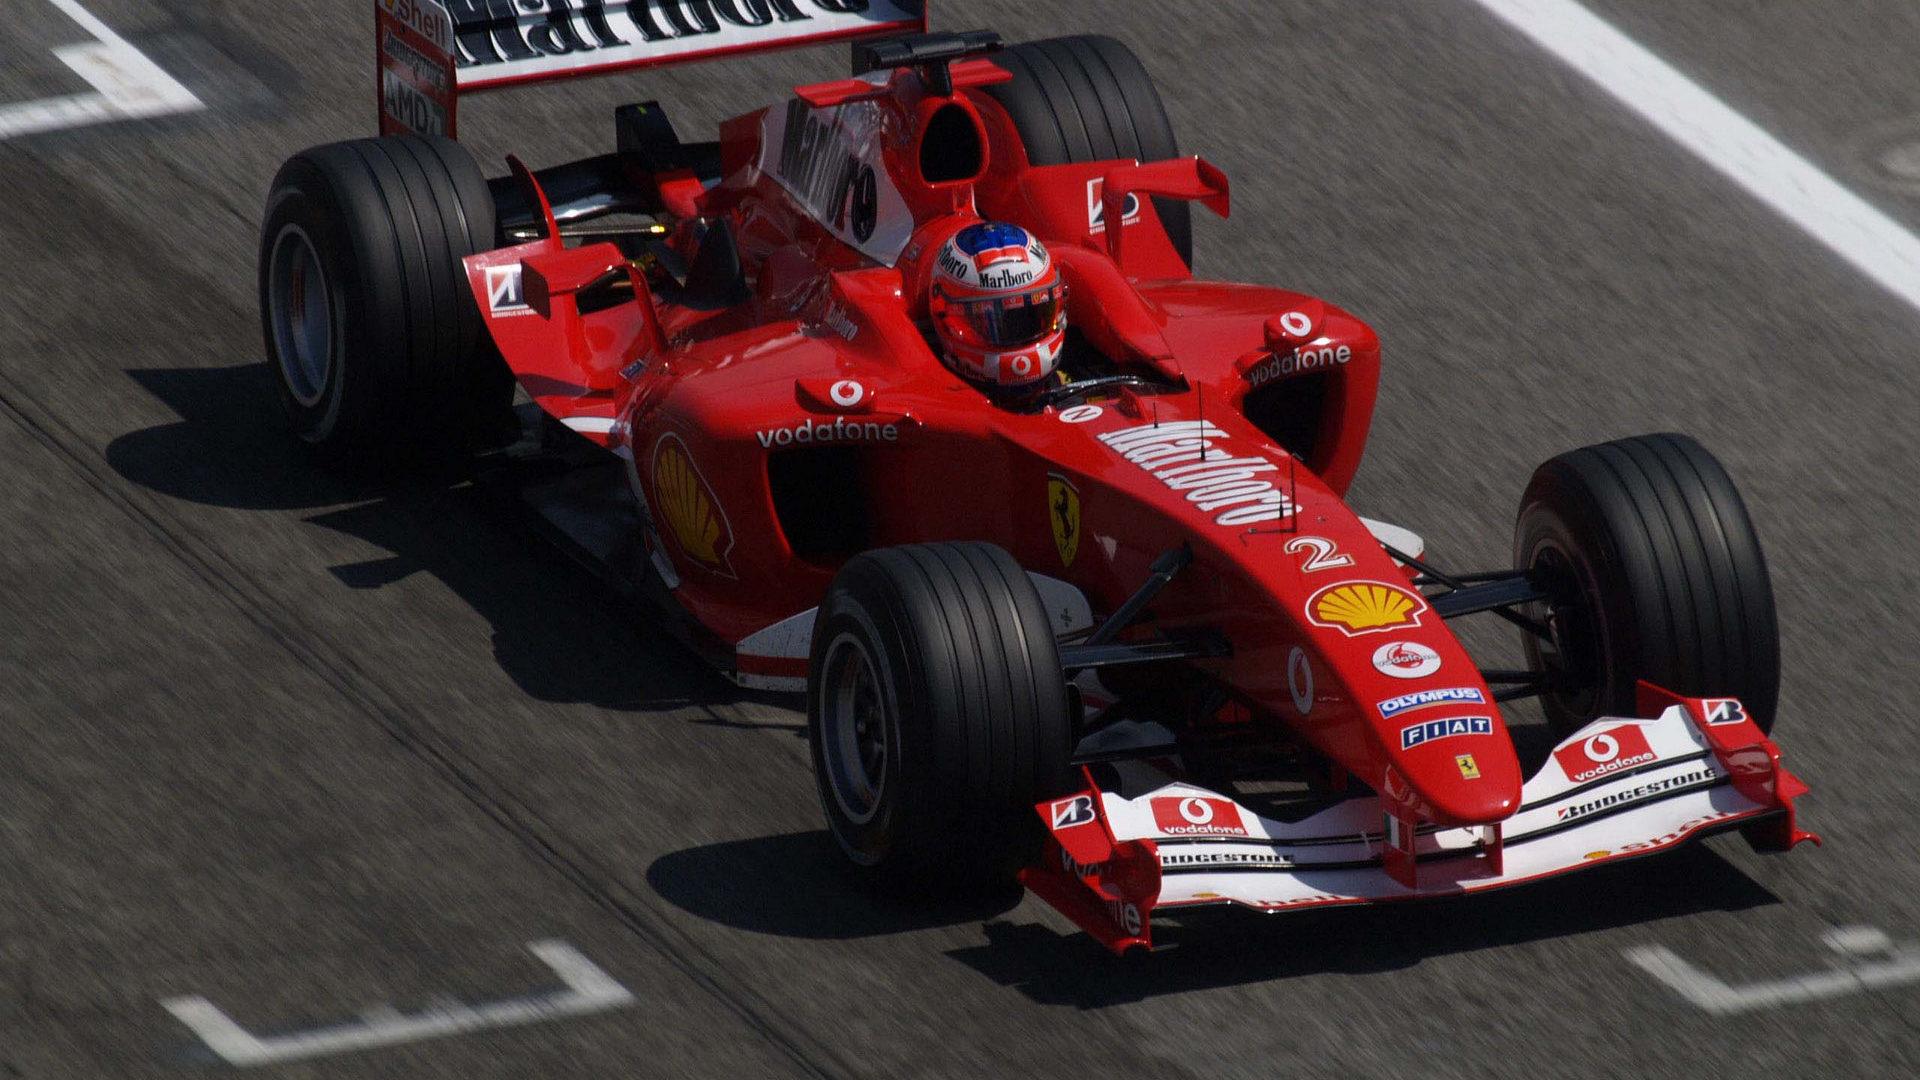 Hd Wallpapers 2004 Formula 1 Grand Prix Of San Marino F1